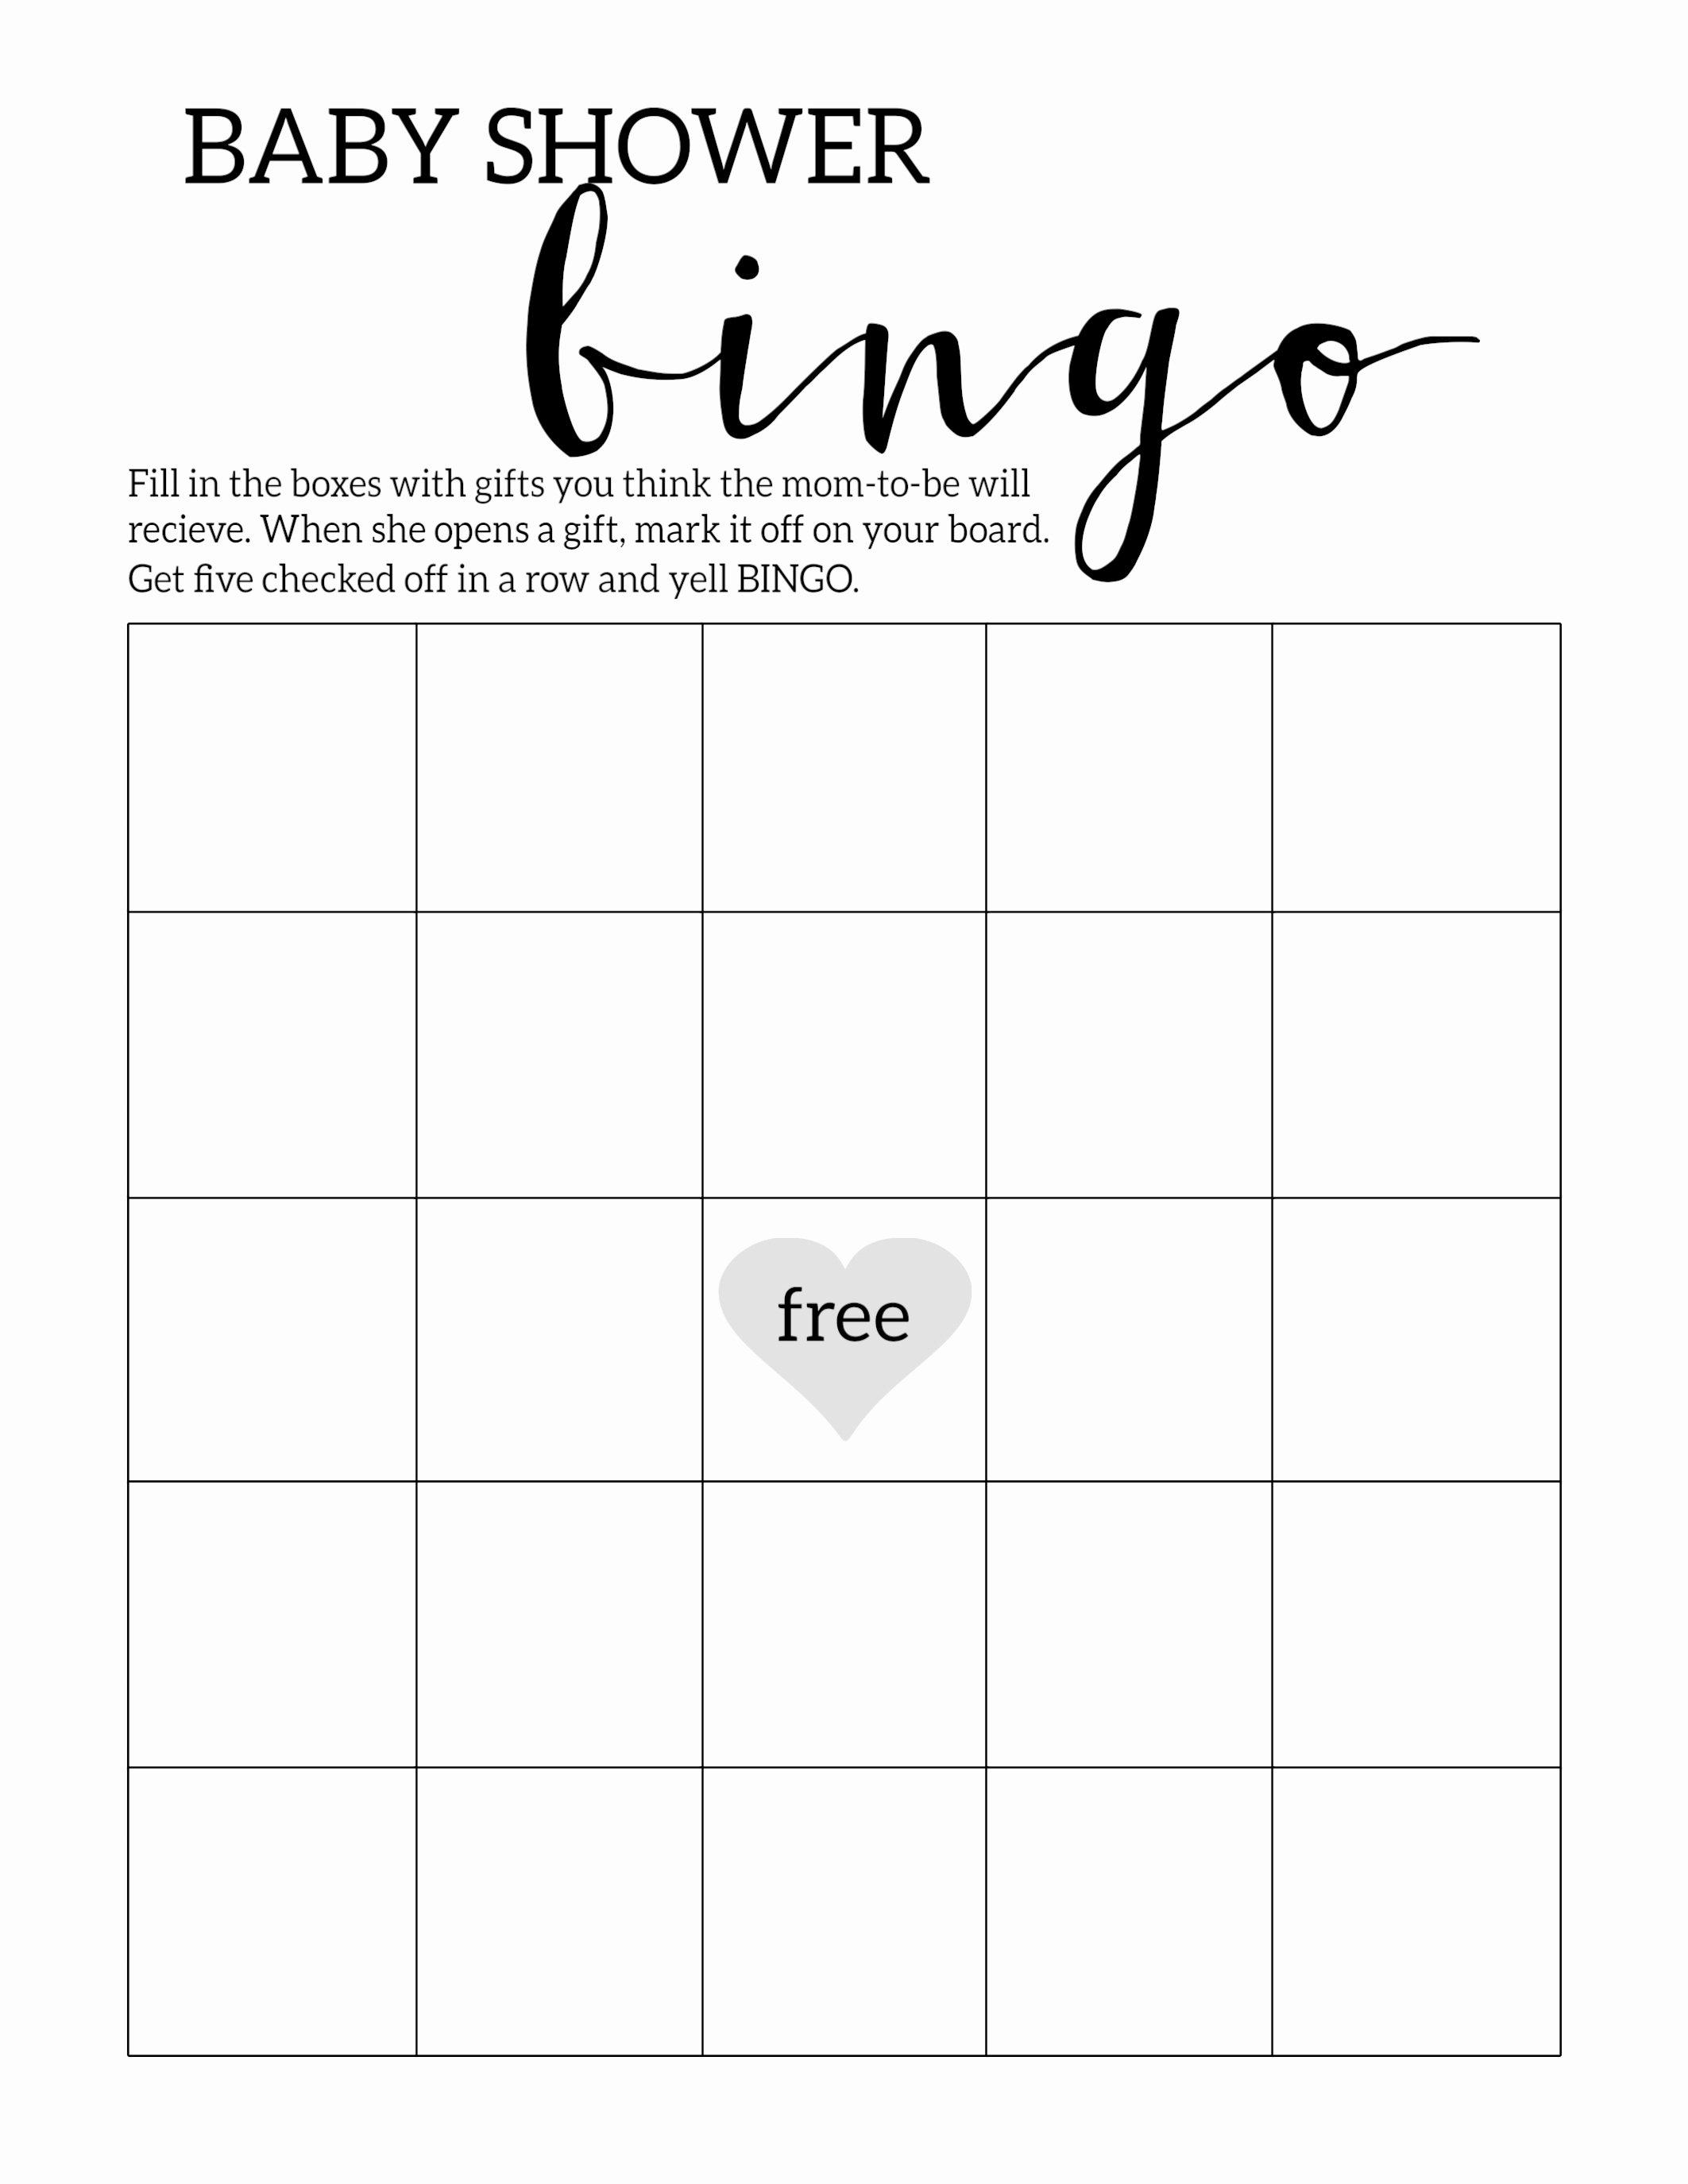 Baby Shower Gift Bingo Printable Blank Gift Ftempo